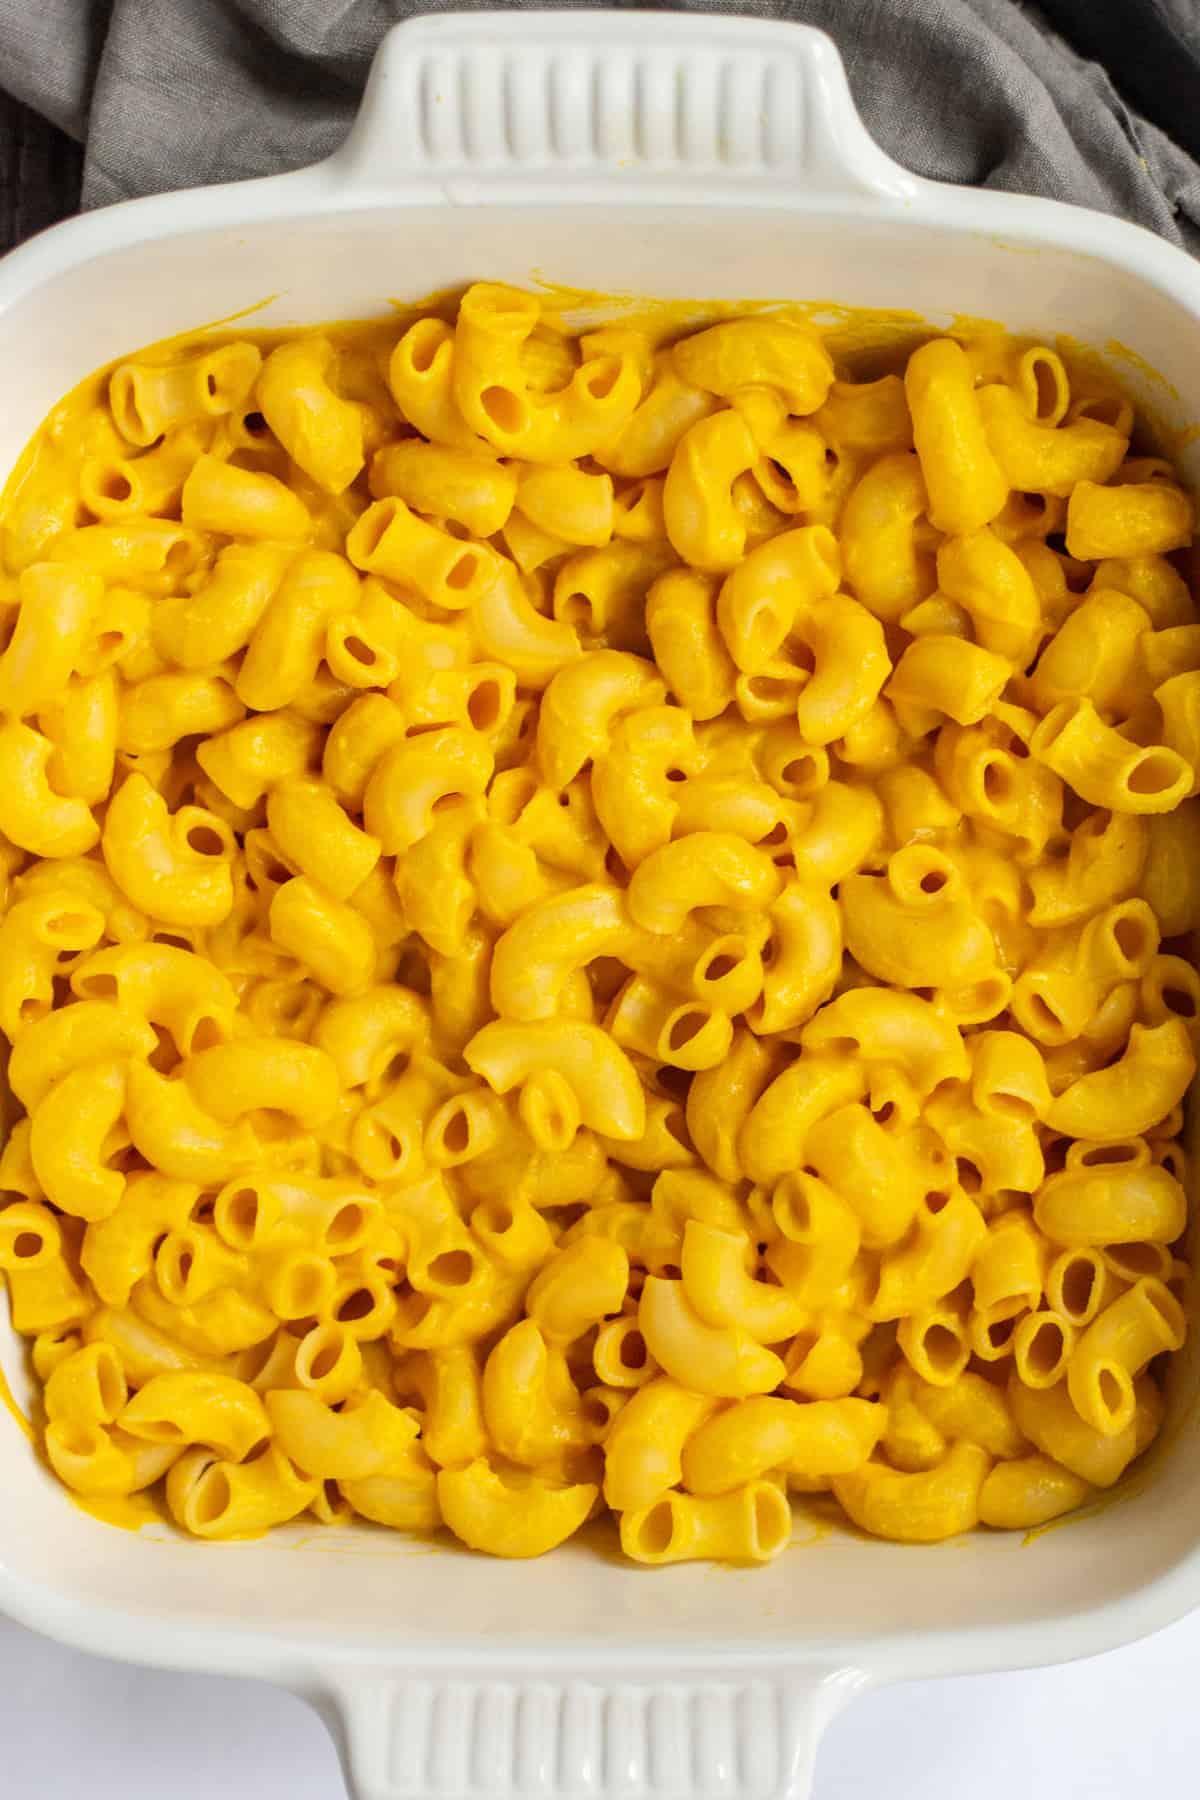 Easy Vegan Gluten Free Mac and Cheese | Vegan Comfort Food | Gluten Free Comfort Food | Vegan Mac and Cheese | Gluten Free Mac and Cheese | Vegan Queso | Mac and Cheese | Mac and Cheese using Vegan Queso| Healthy Comfort Food || The Butter Half #macandcheese #glutenfree #thebutterhalf